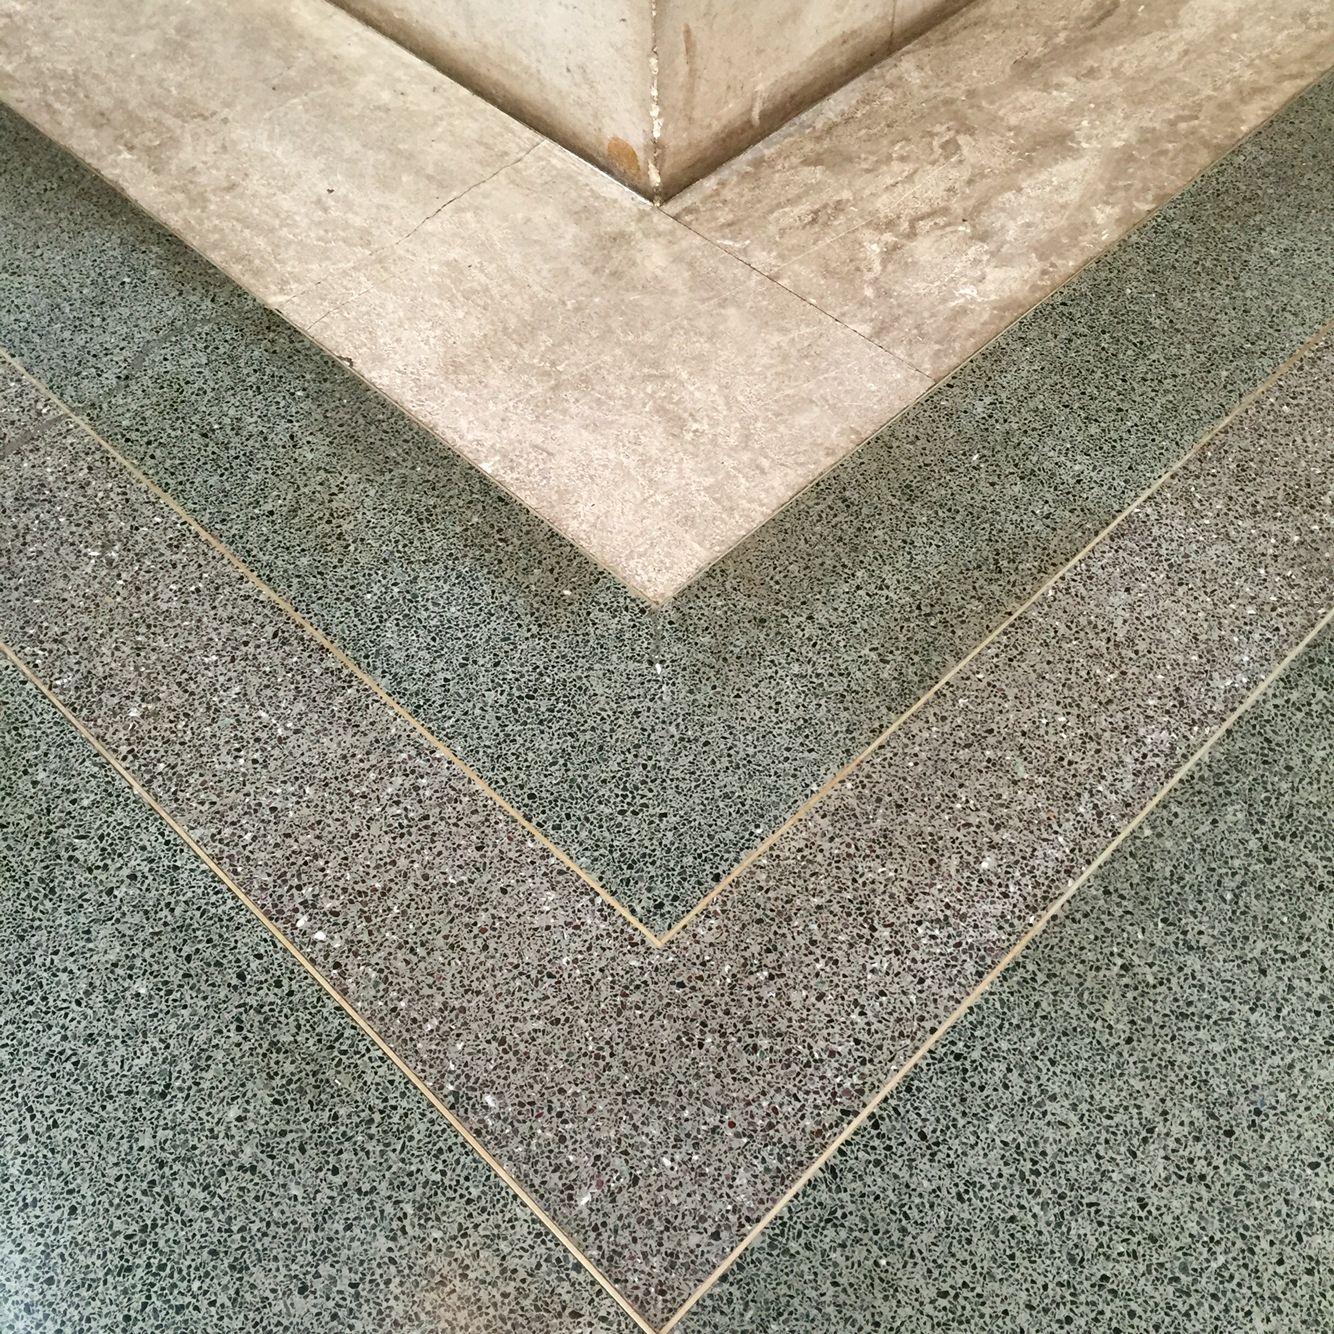 Tate Britain Terrazzo Floor